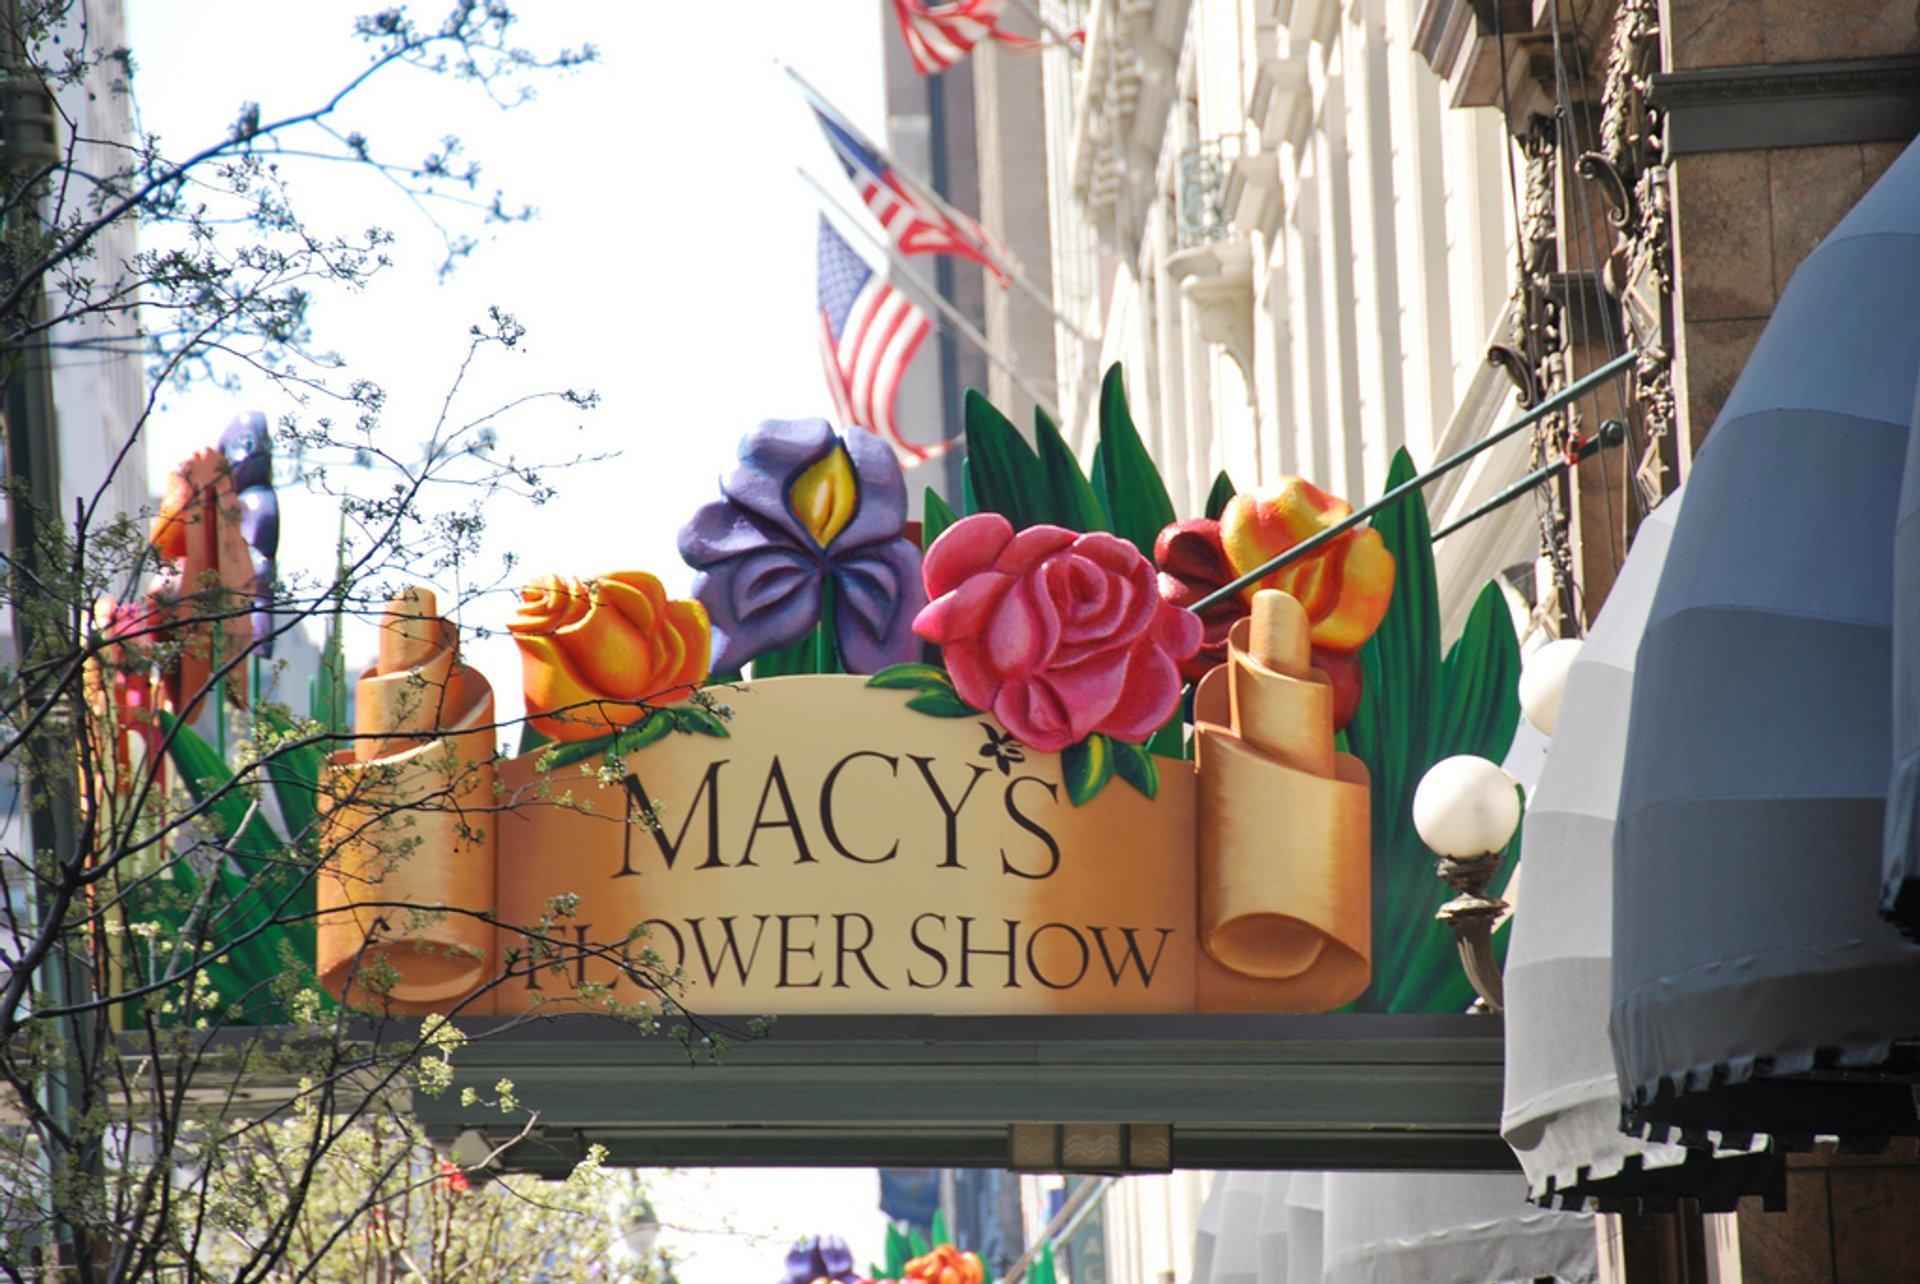 Macys Flower Show 2020.Macy S Flower Show 2019 In New York Dates Map